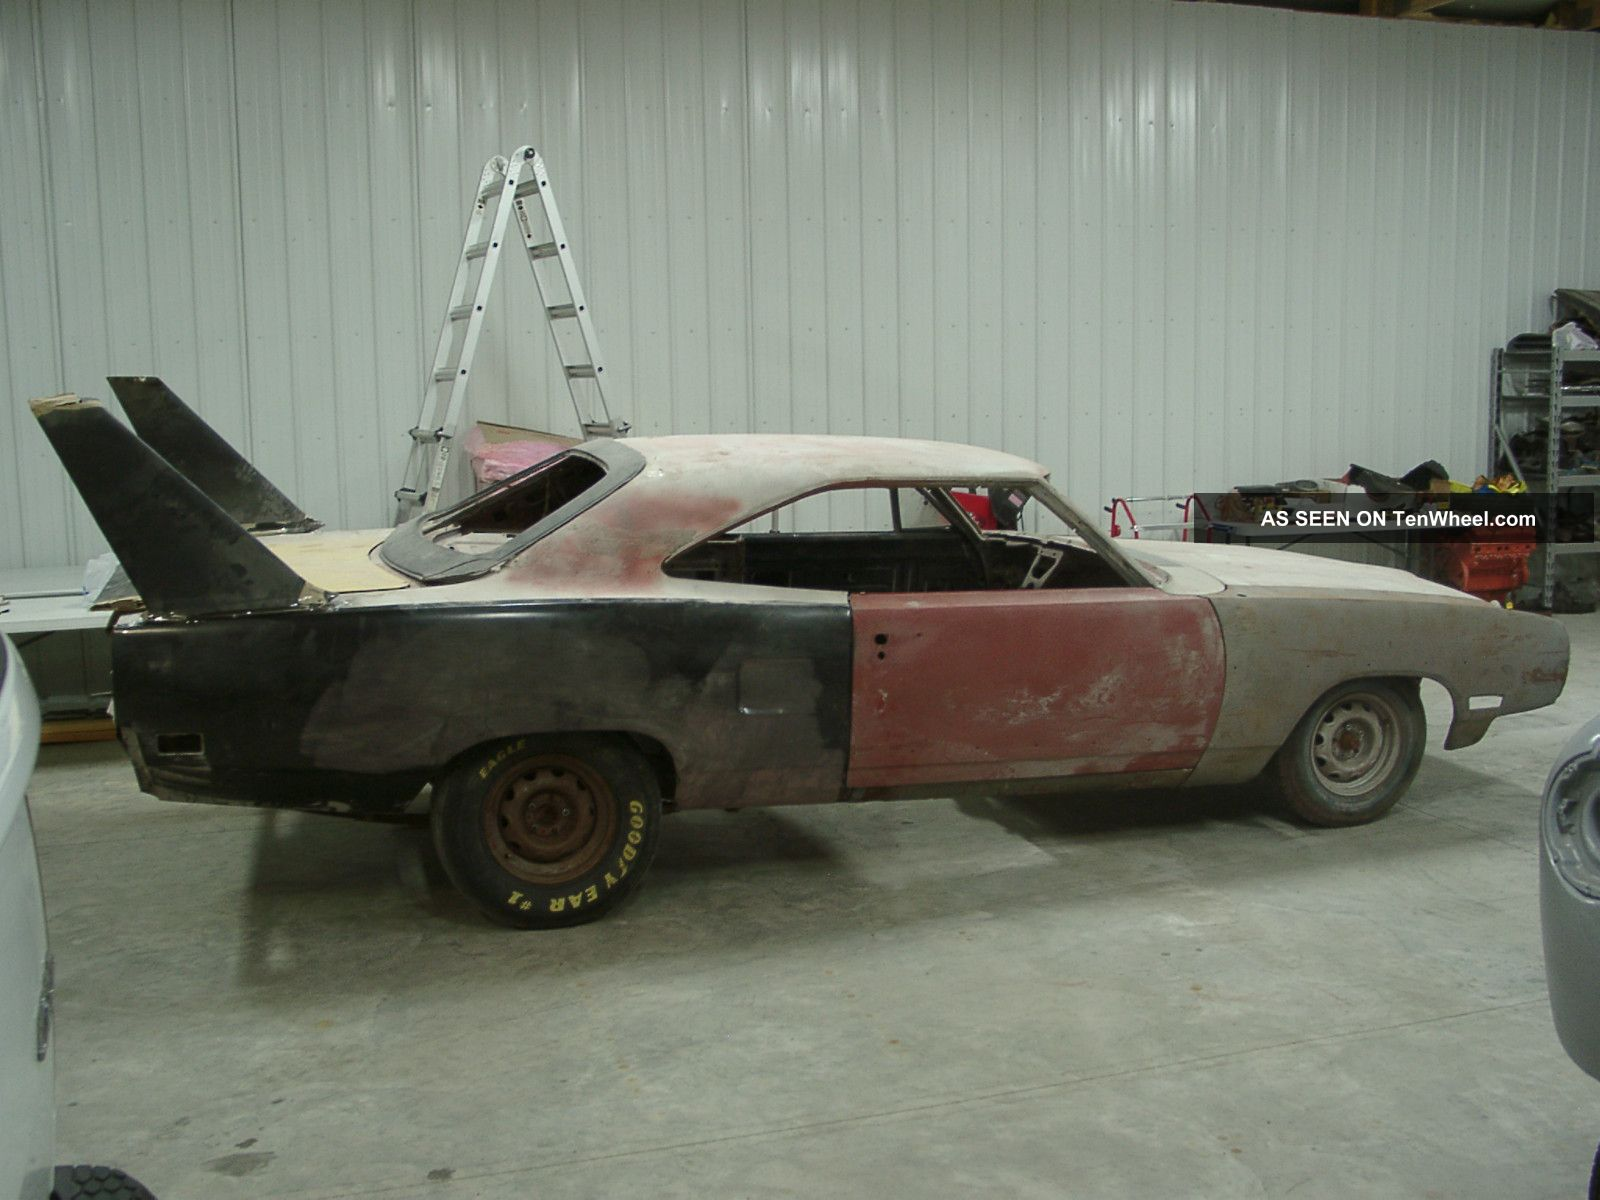 1970 Superbird Project For Sale >> 1970 Plymouth Roadrunner Superbird Project 440 Big Block 4 Speed Nascar Hemi